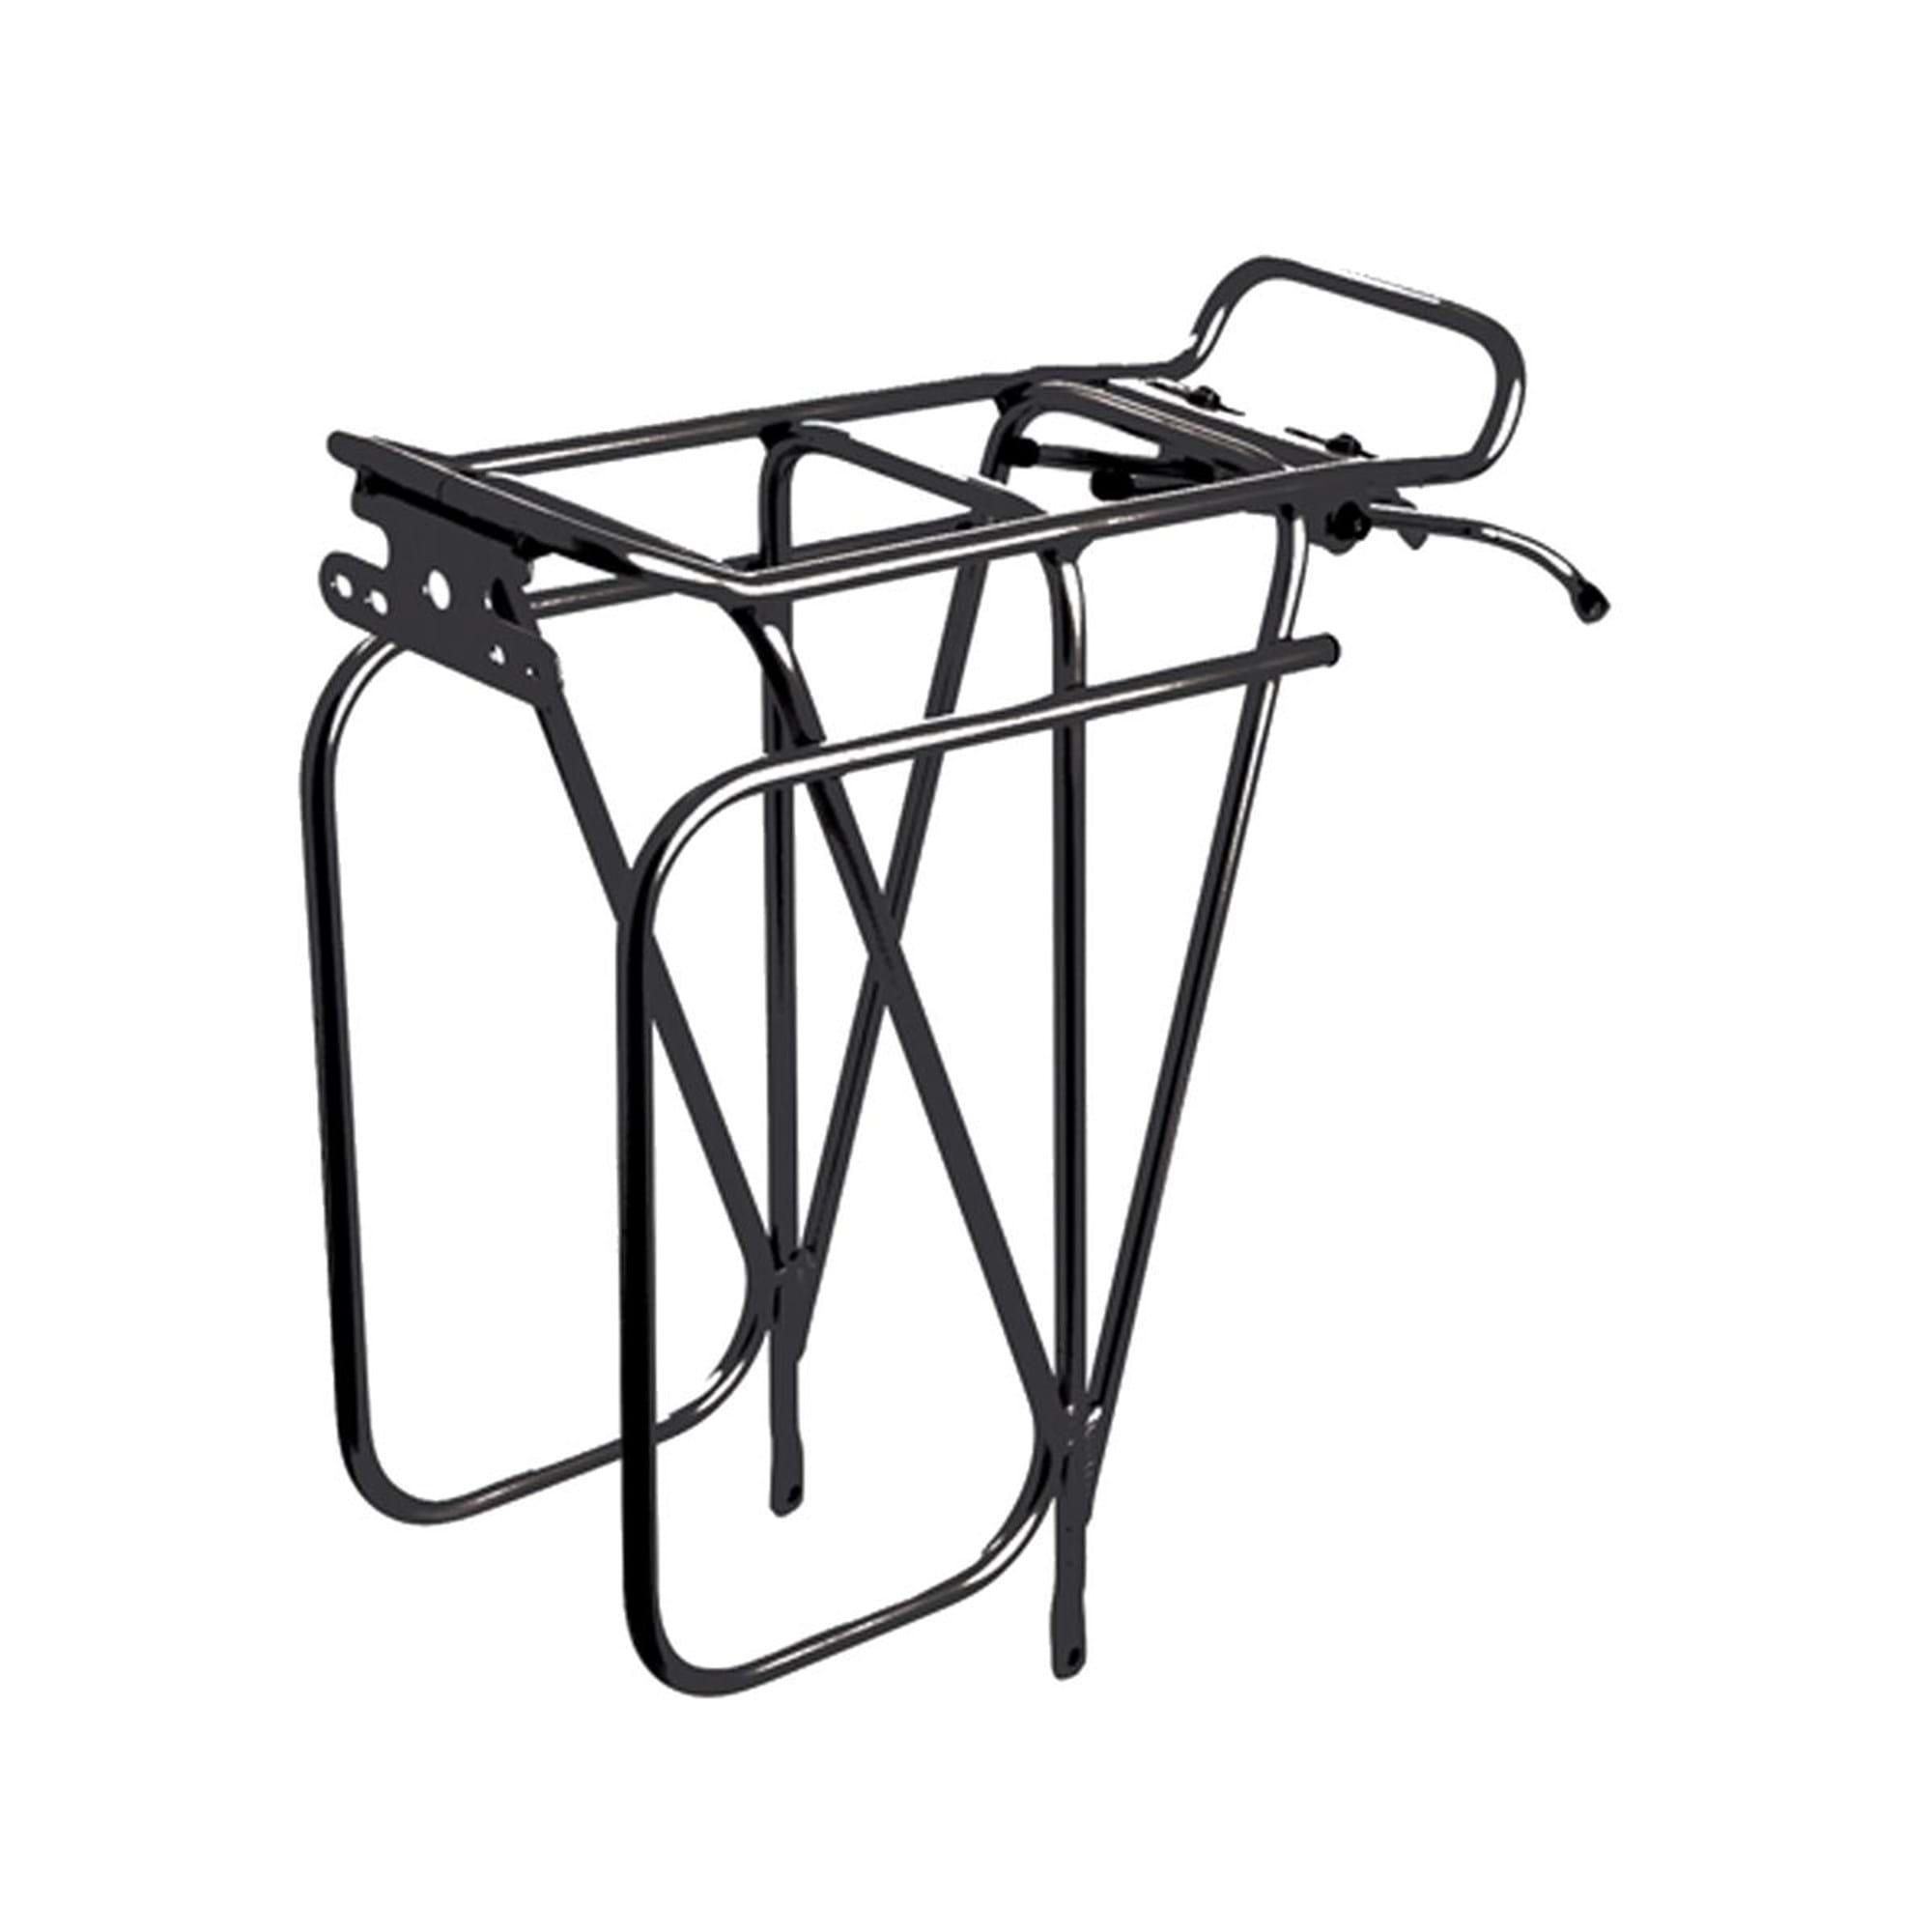 Tortec Expedition Rear Pannier Rack | Rack bags